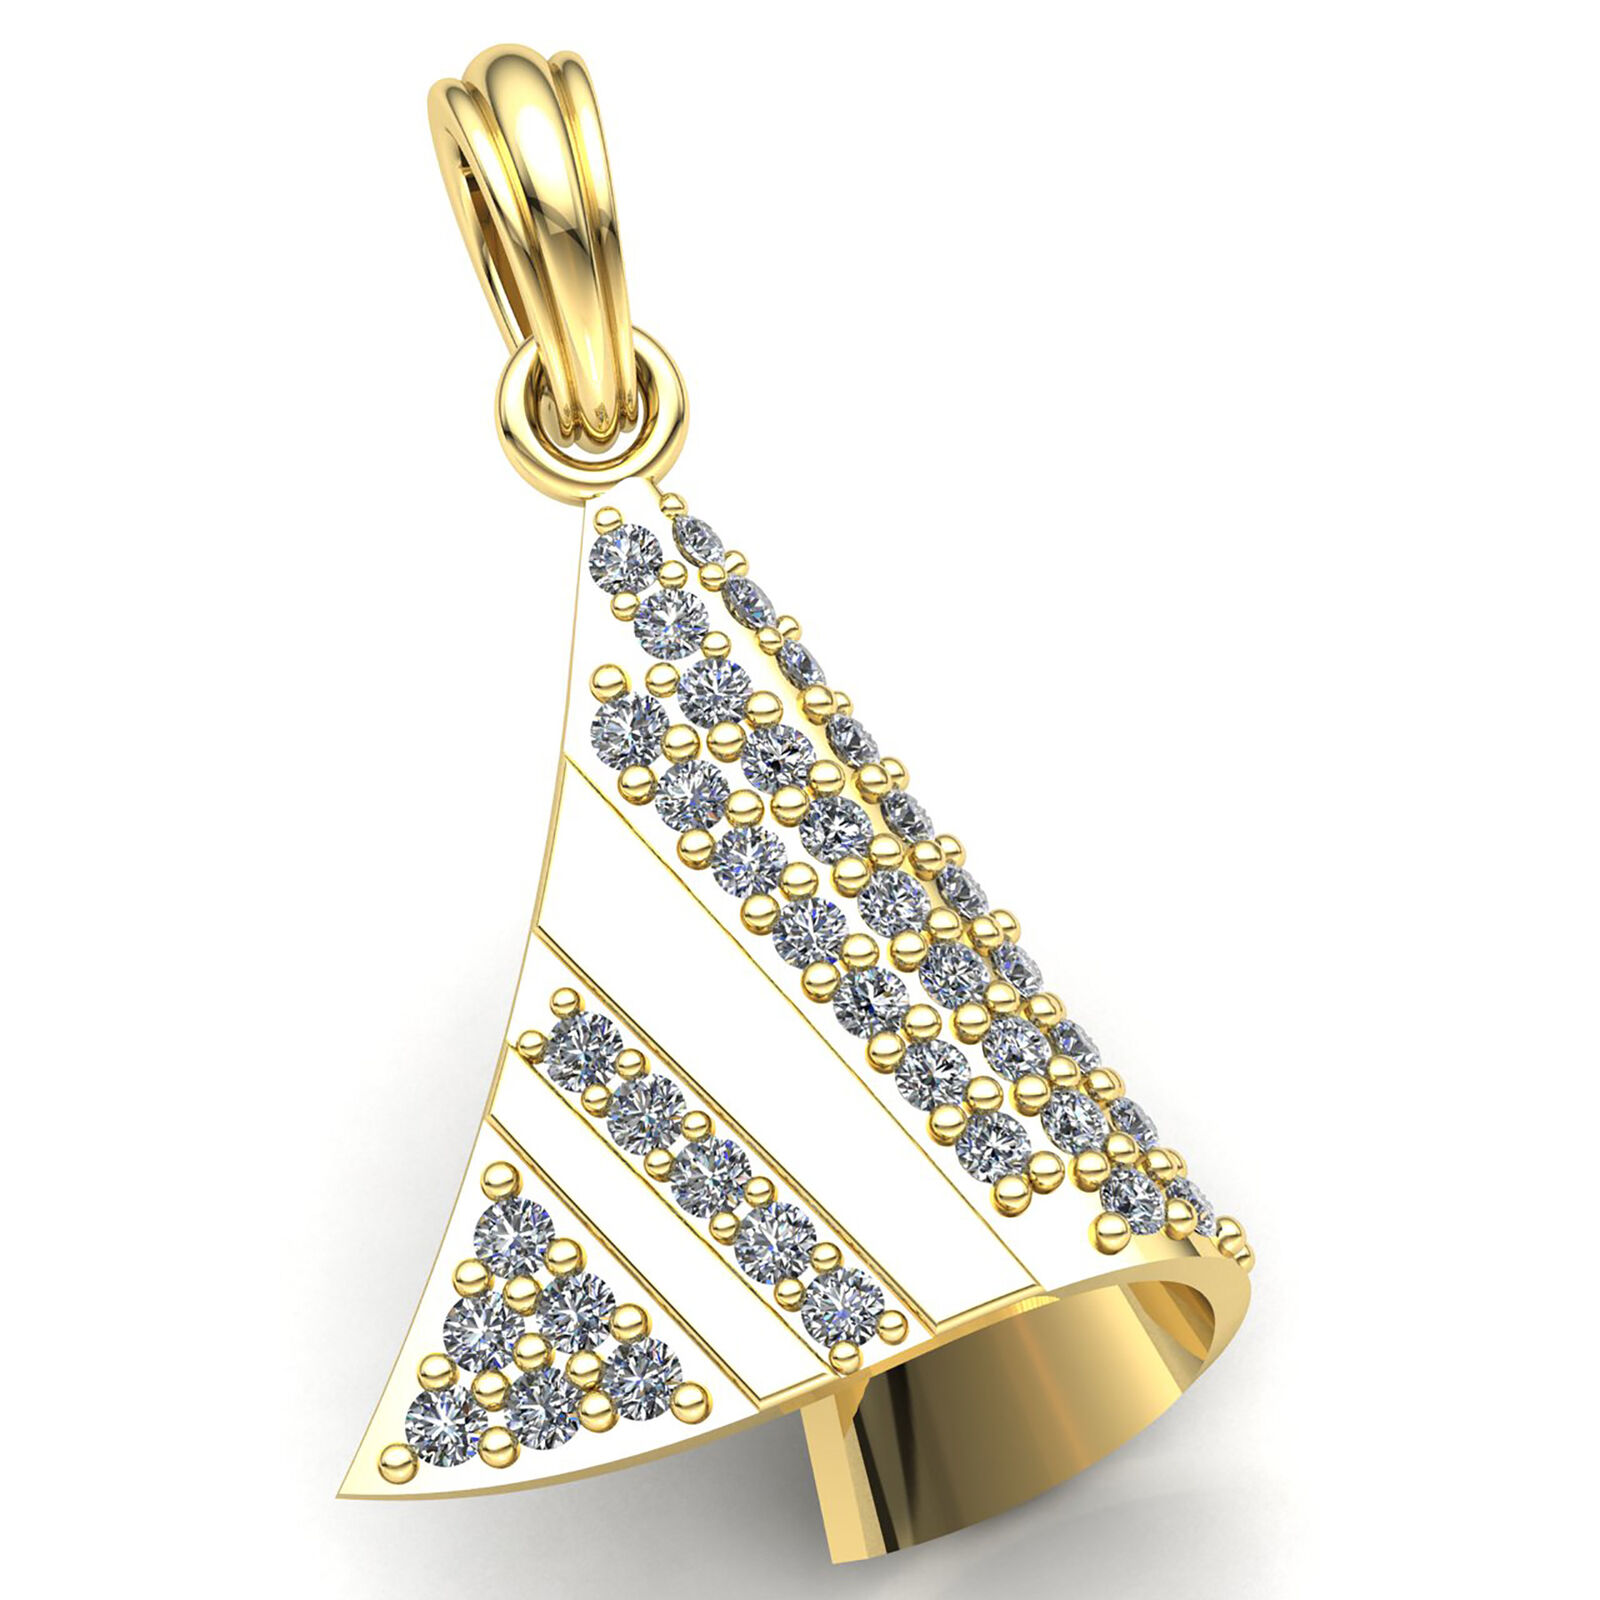 2ctw Genuine Round Cut Diamond Ladies Twisted Pave Cone Pendant 14K gold